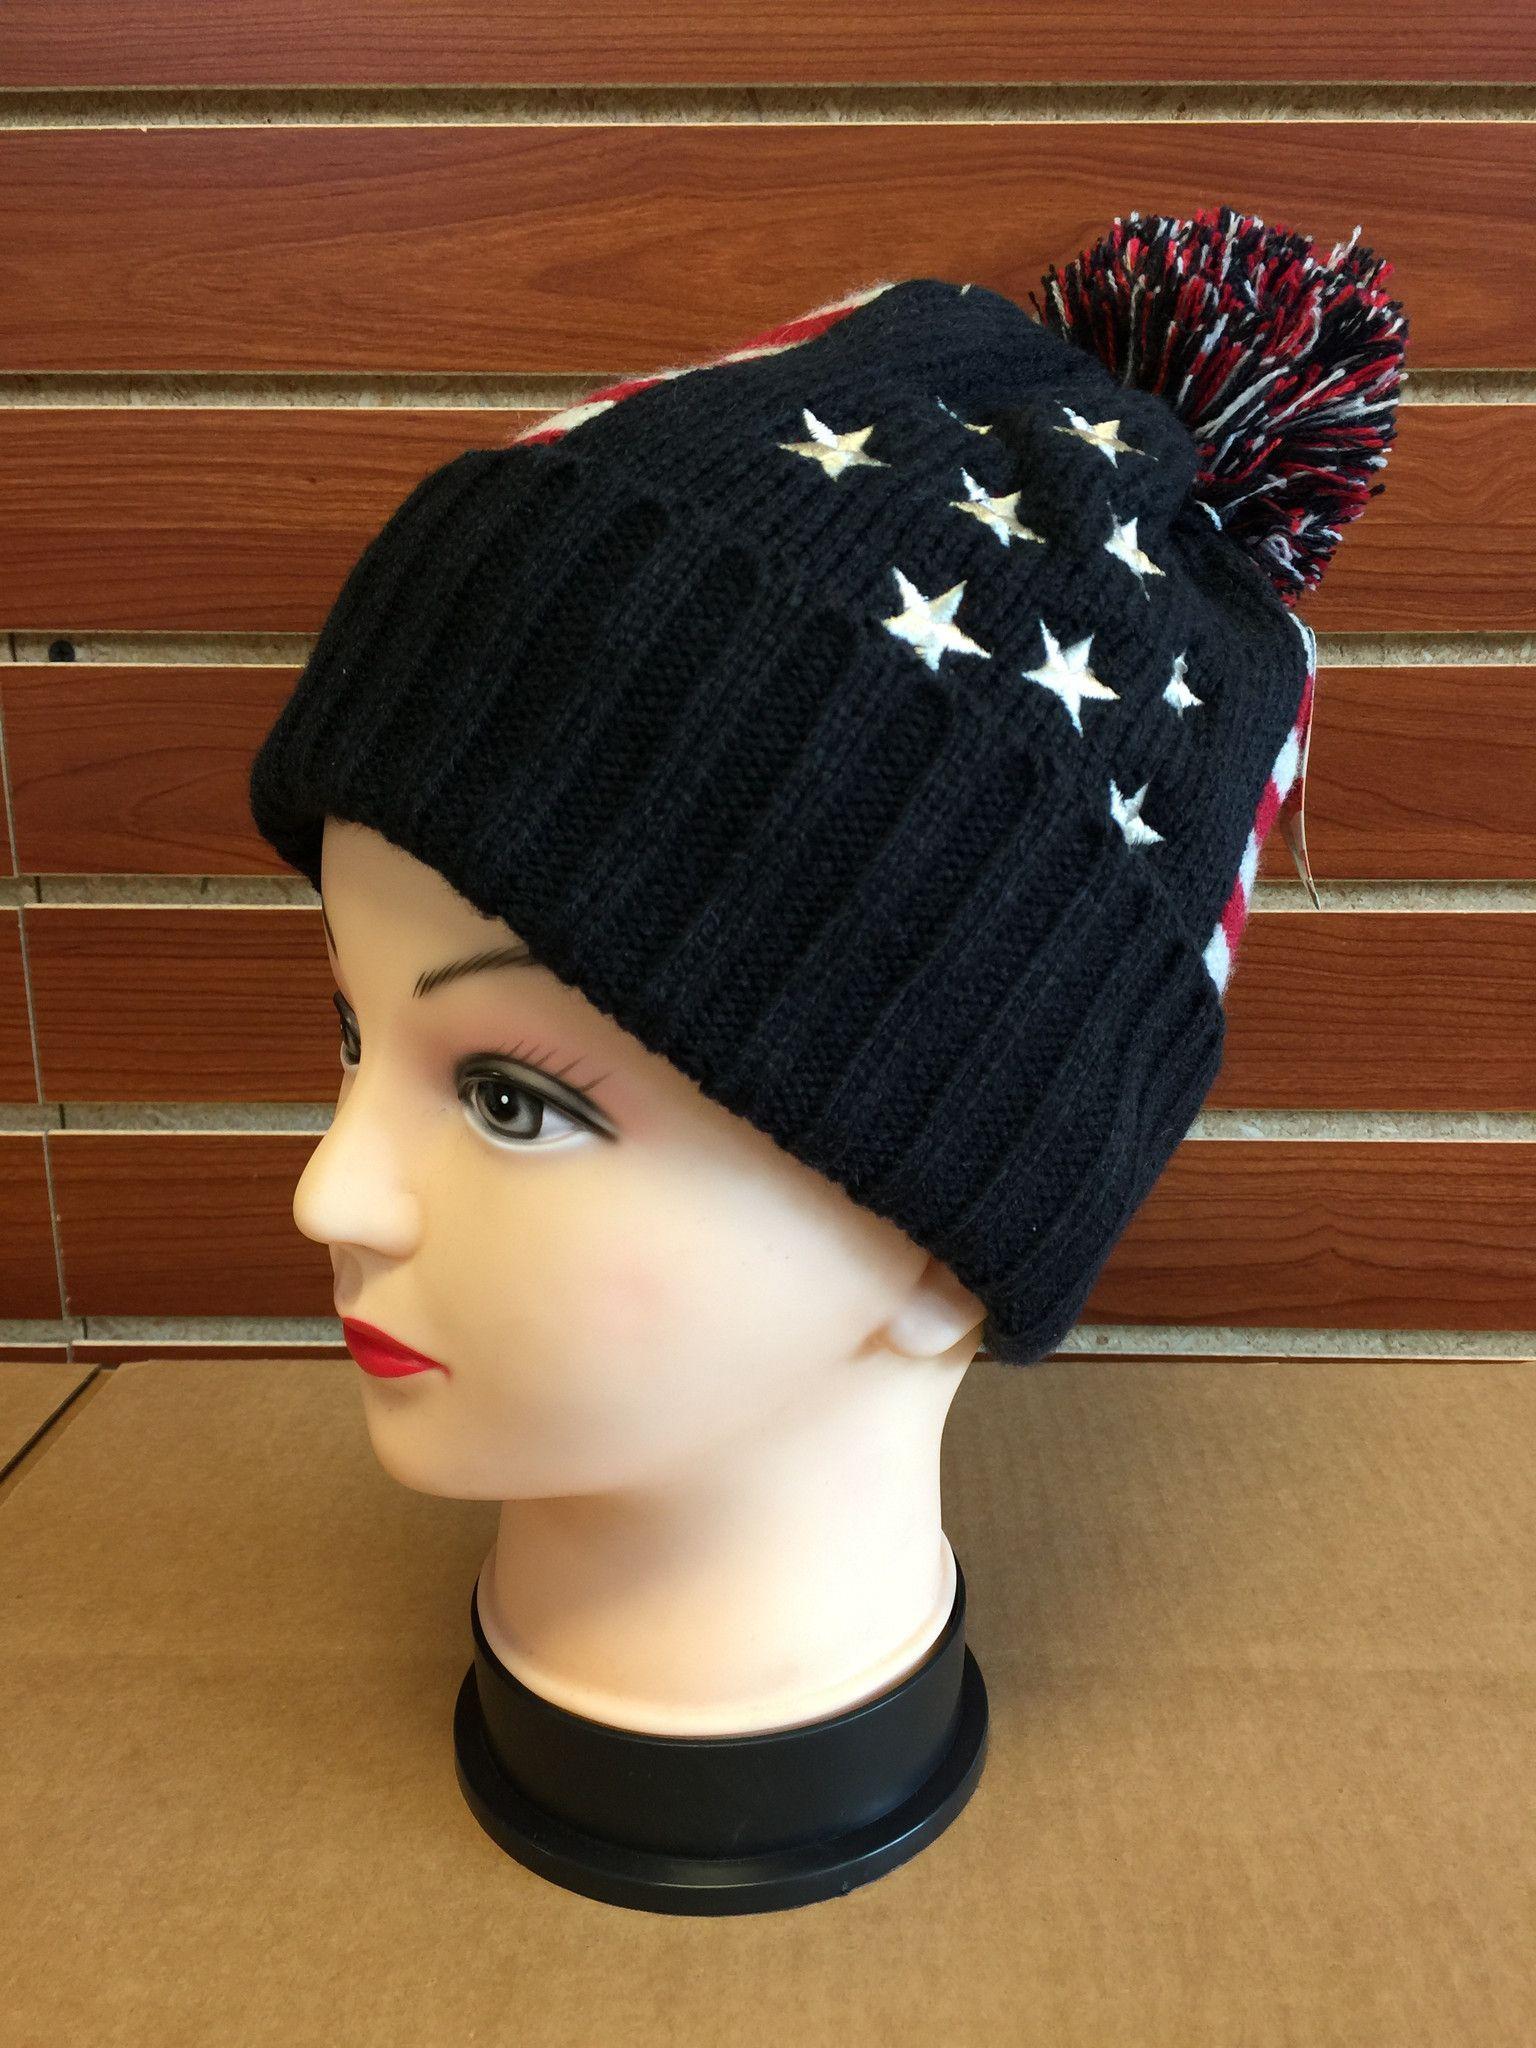 cf27f419295 H 53029 Hats Cap Hat winter 12PCS  Pack or 2PCS  Pack